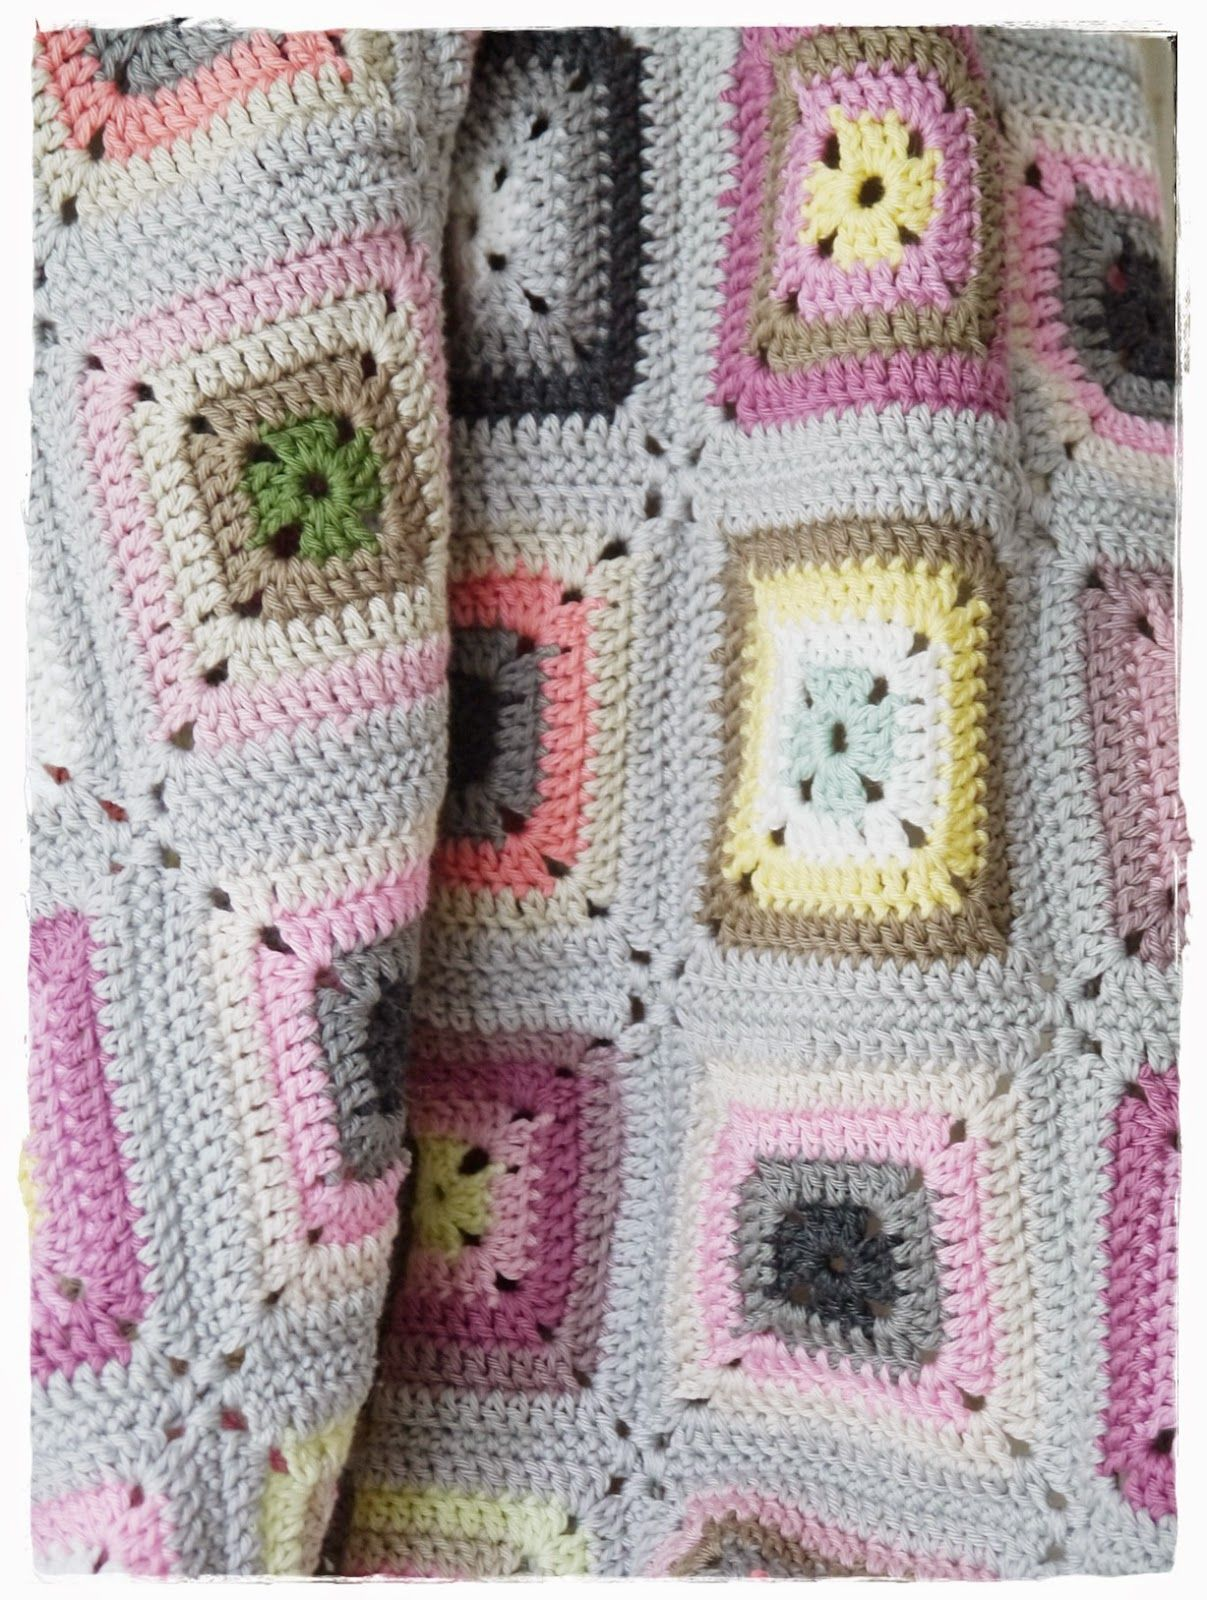 lovely crochet blanket @ Versponnenes - free pattern here but need ...